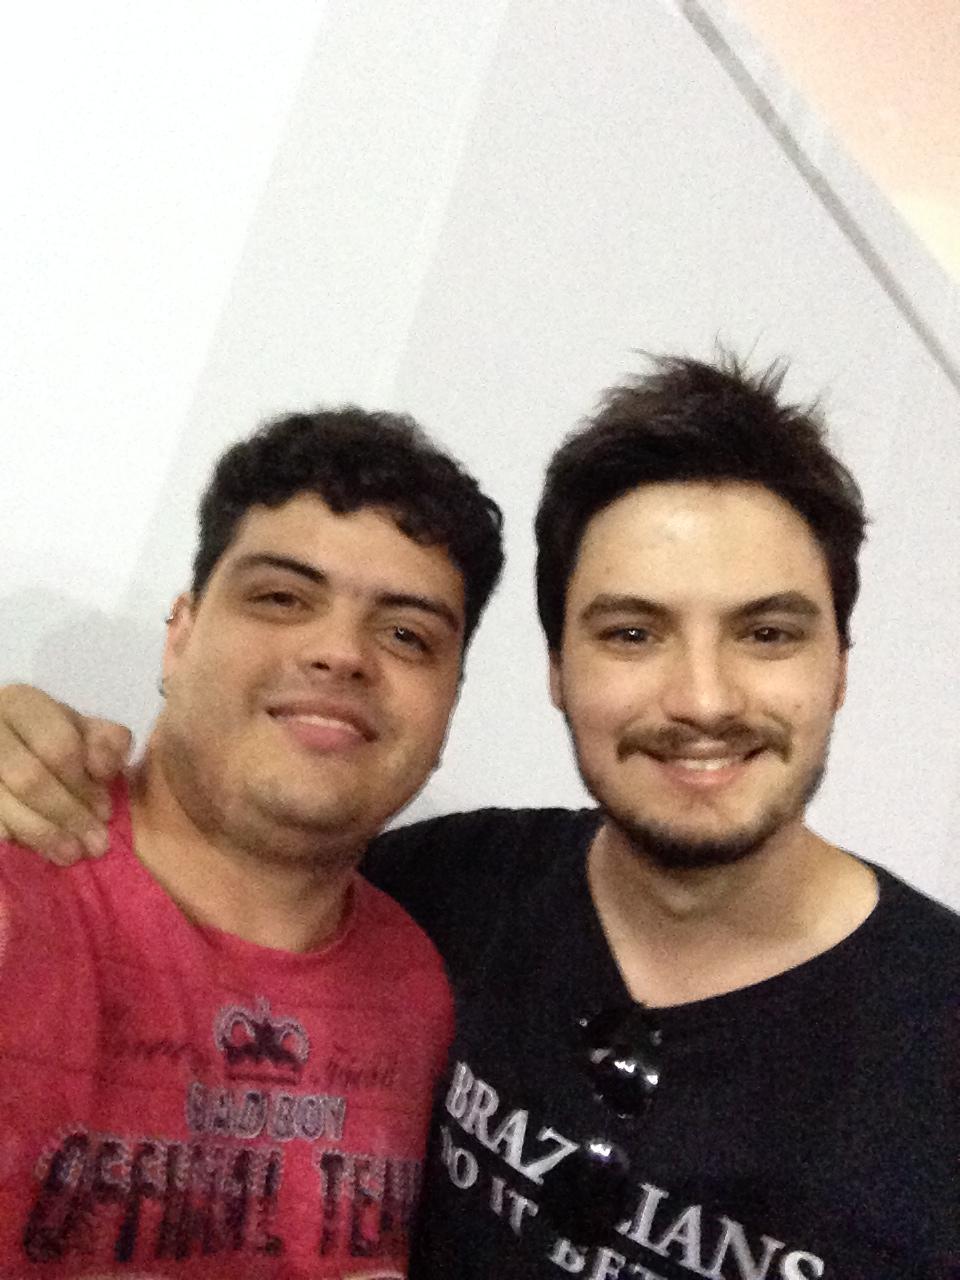 carlos_felipe_neto_youpix